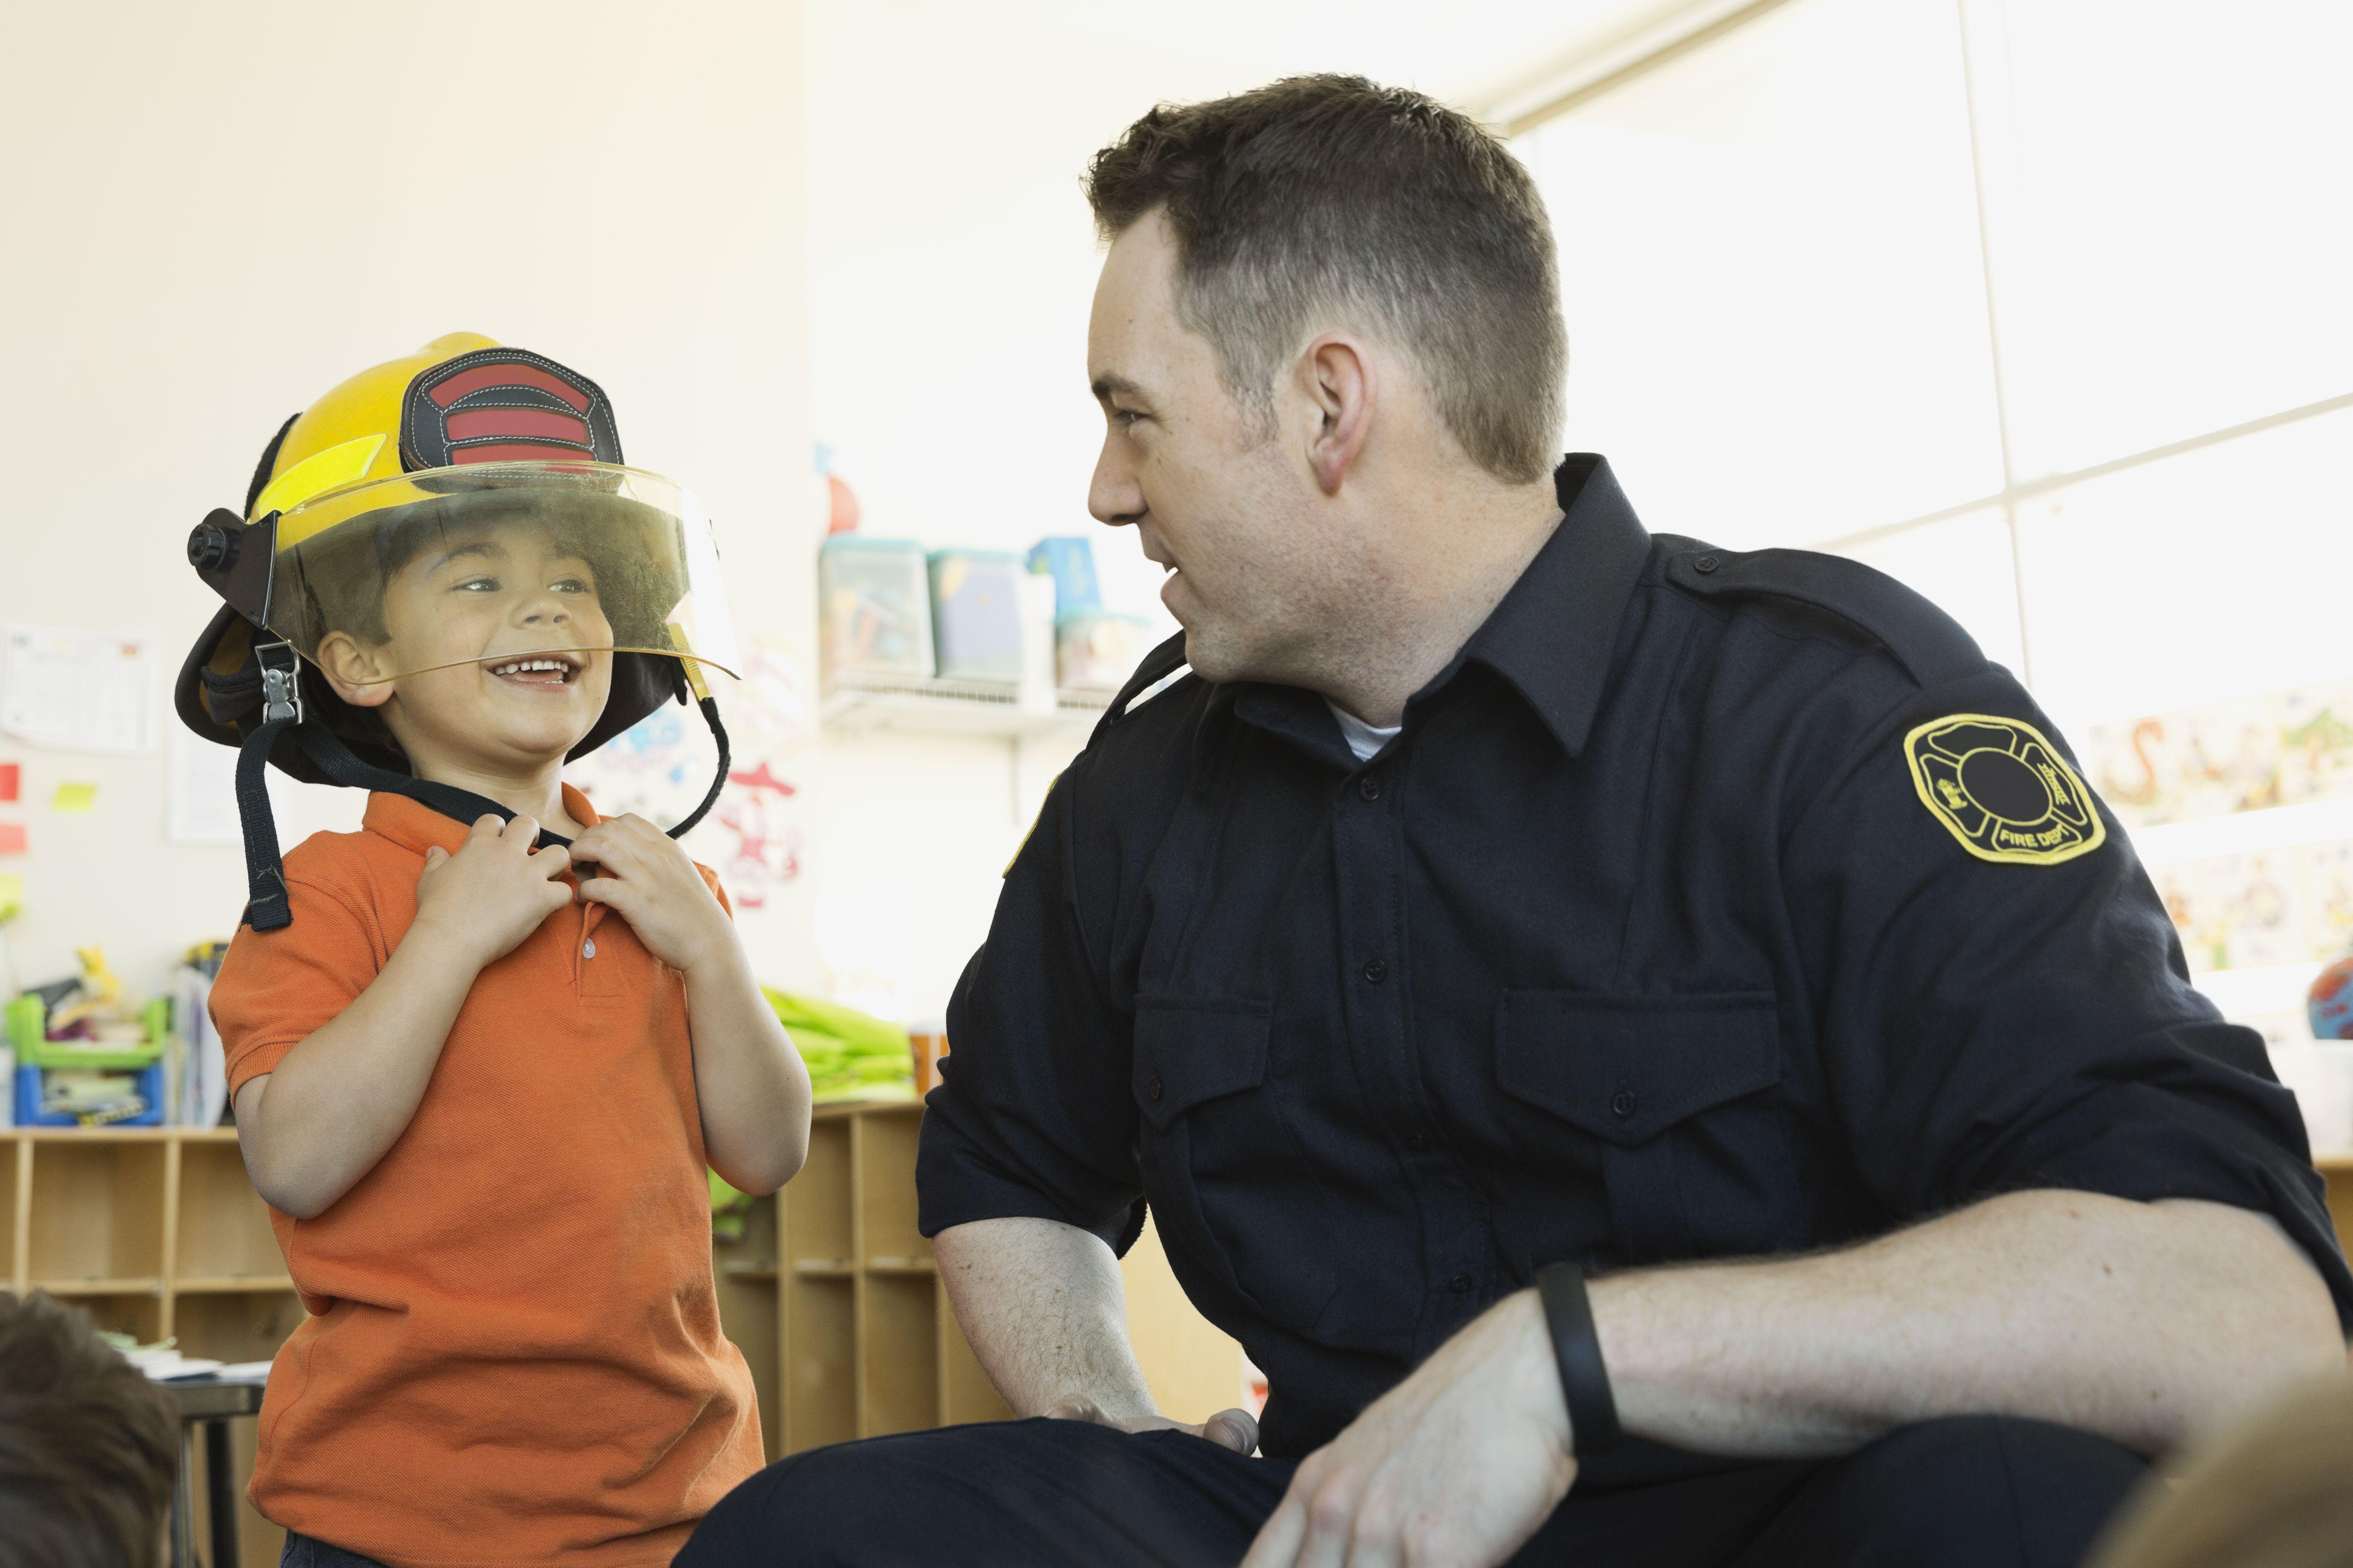 How To Teach Kids To Call 911